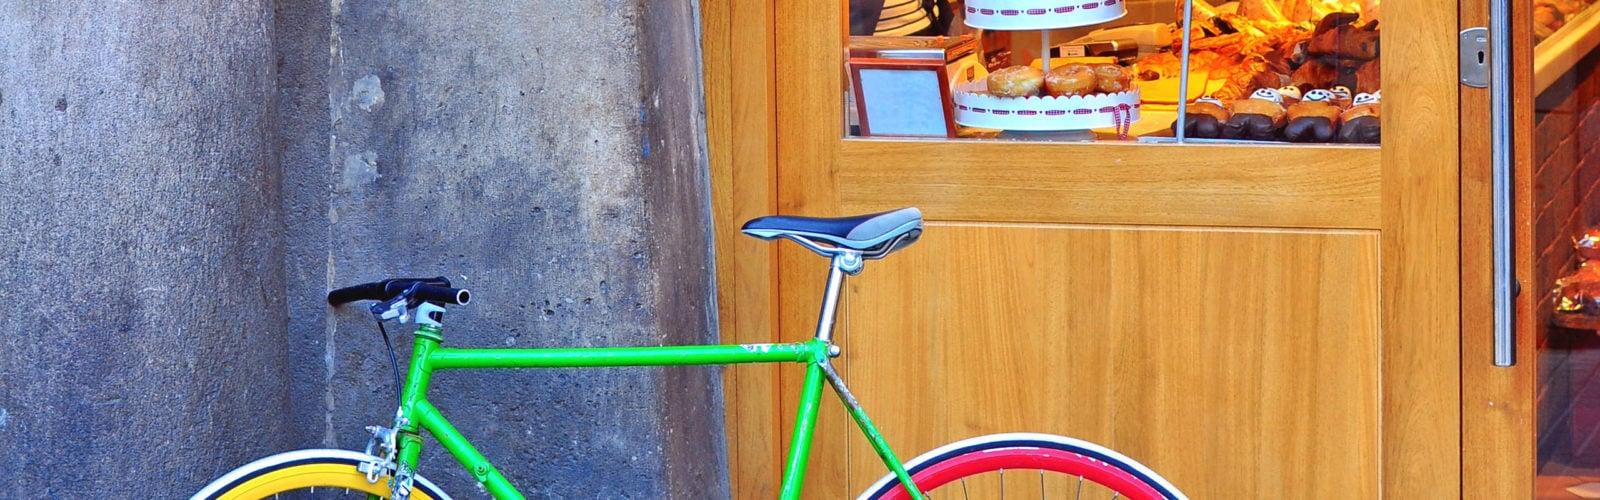 bike-doughnuts-melbourne-australia